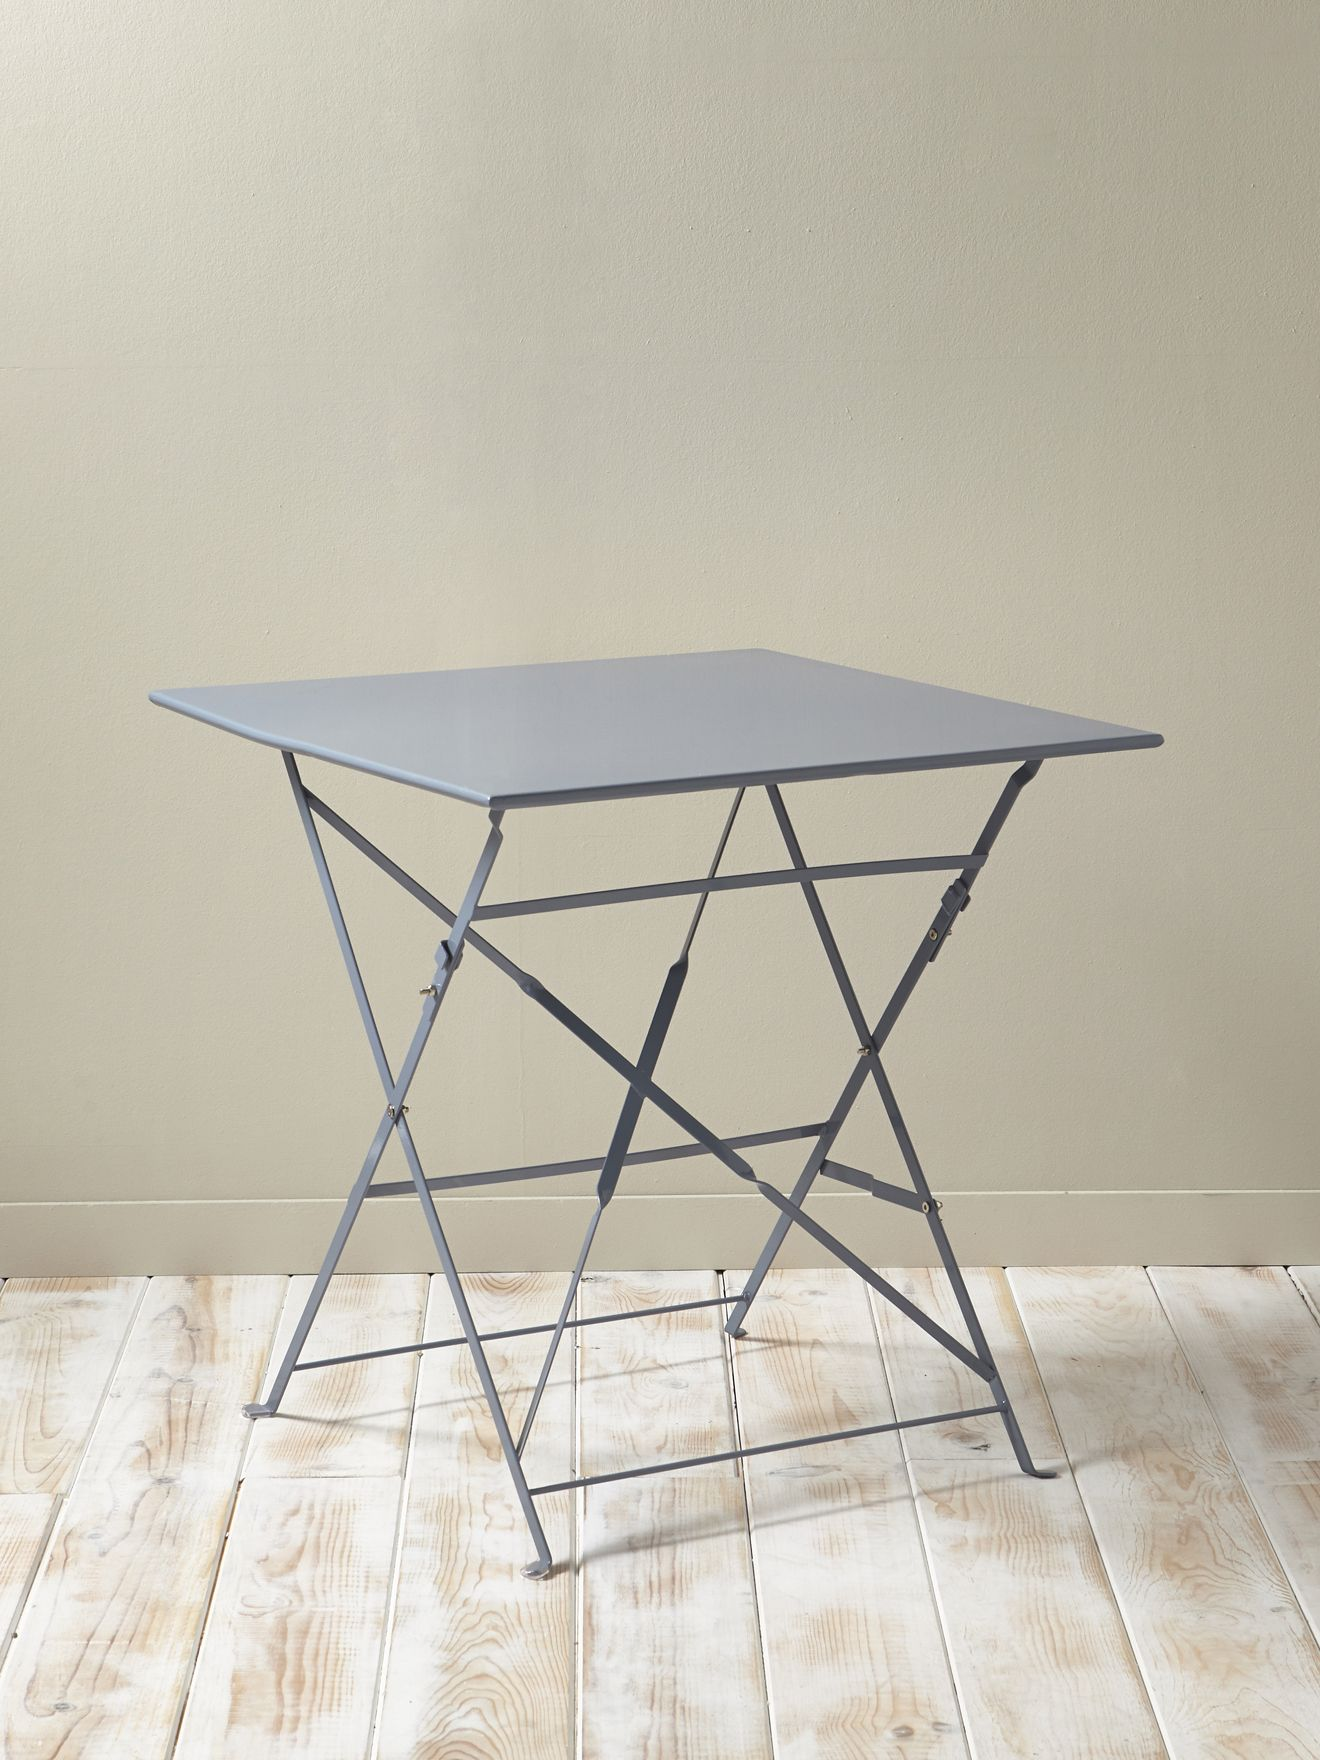 Table de jardin métal cyrillus 35 € http://www.cyrillus.fr/table-de ...